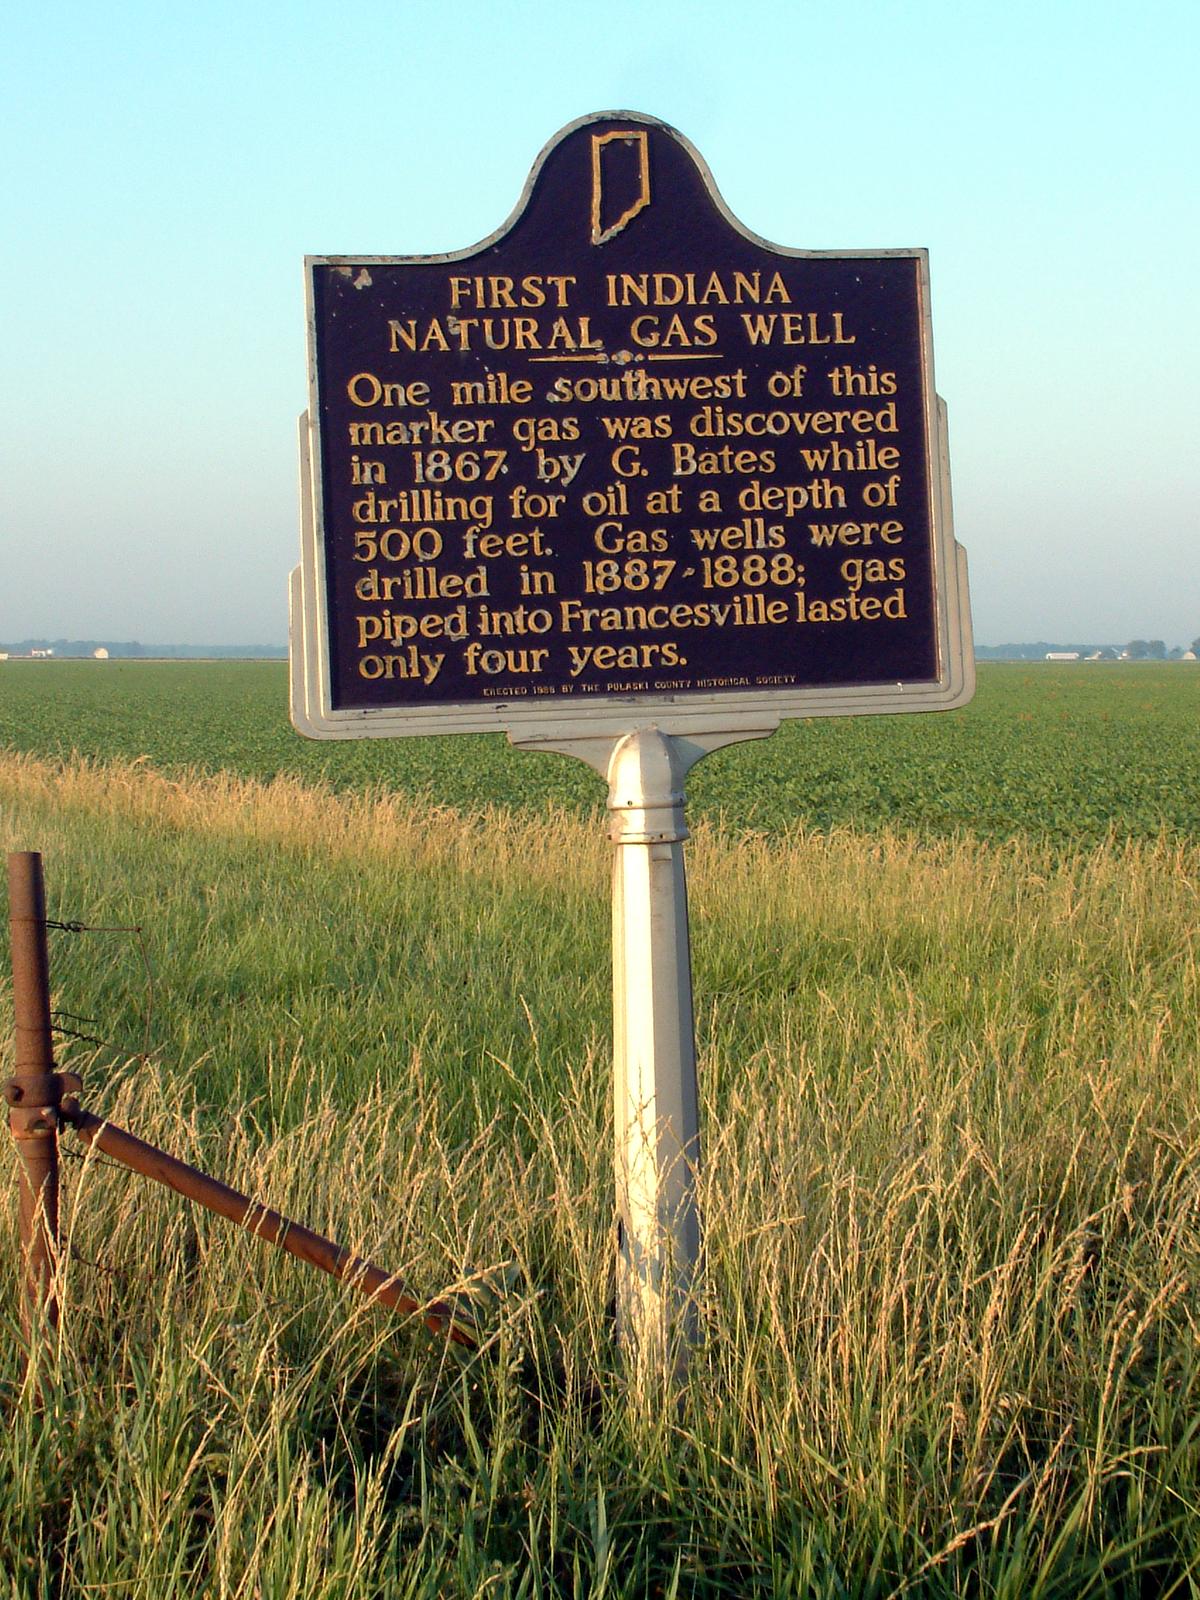 Indiana pulaski county francesville - File Pulaski County Natural Gas Marker Png